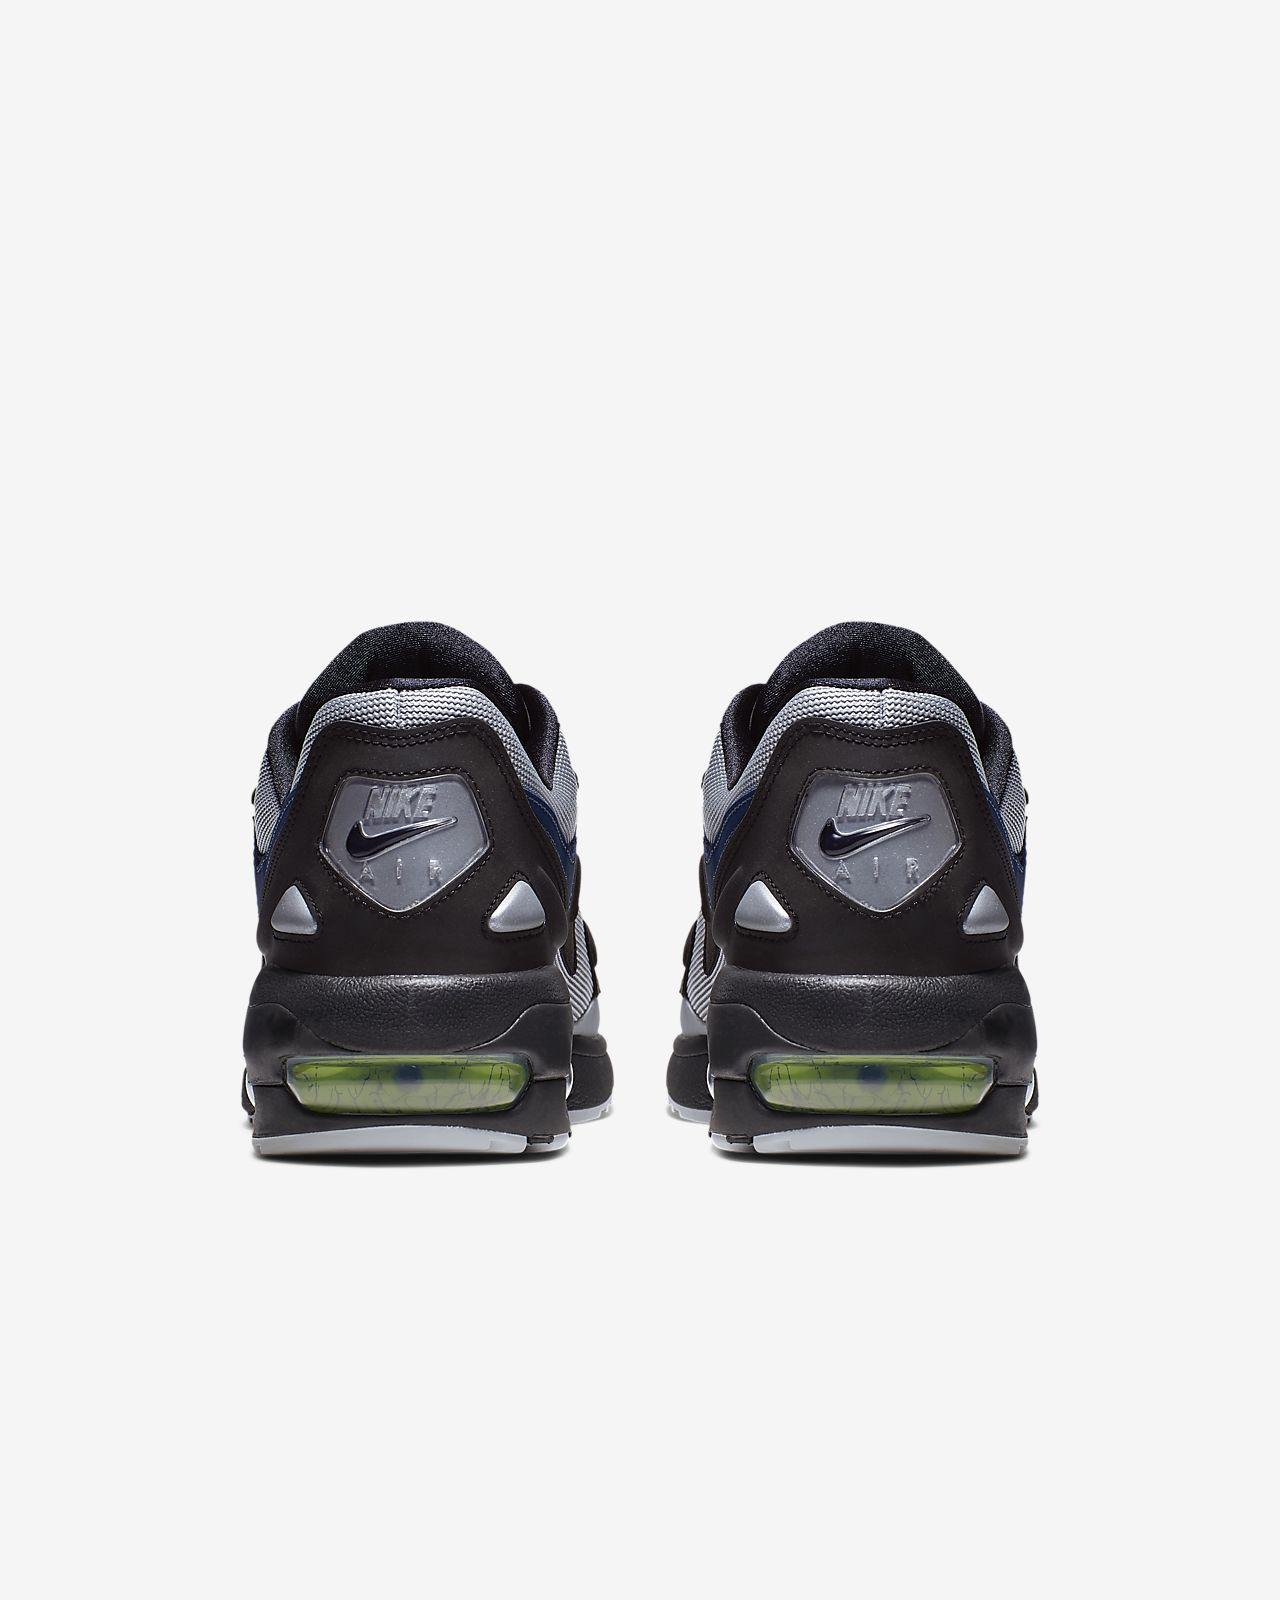 e10a3a9d Мужские кроссовки Nike Air Max2 Light. Nike.com RU